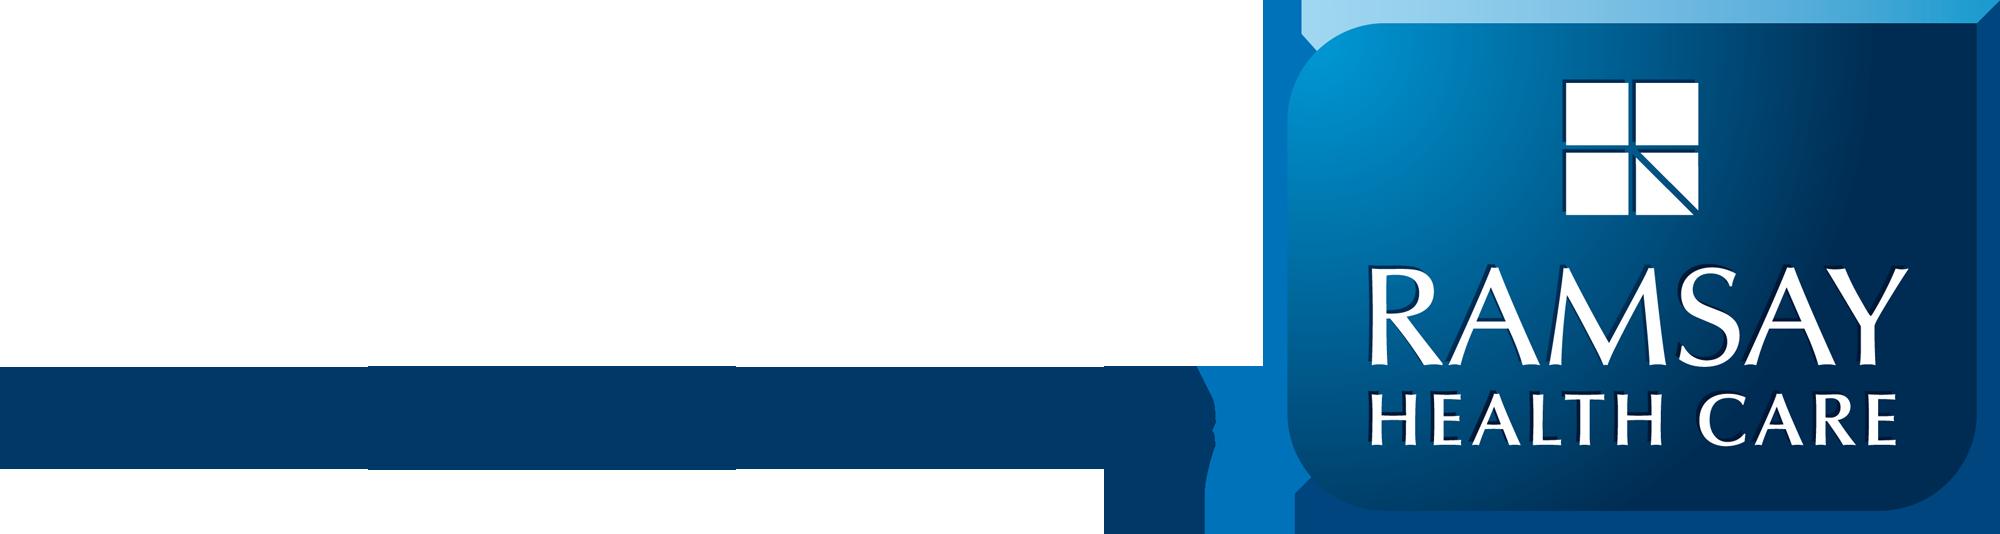 Ramsay-Logo-Strapline-Left.png